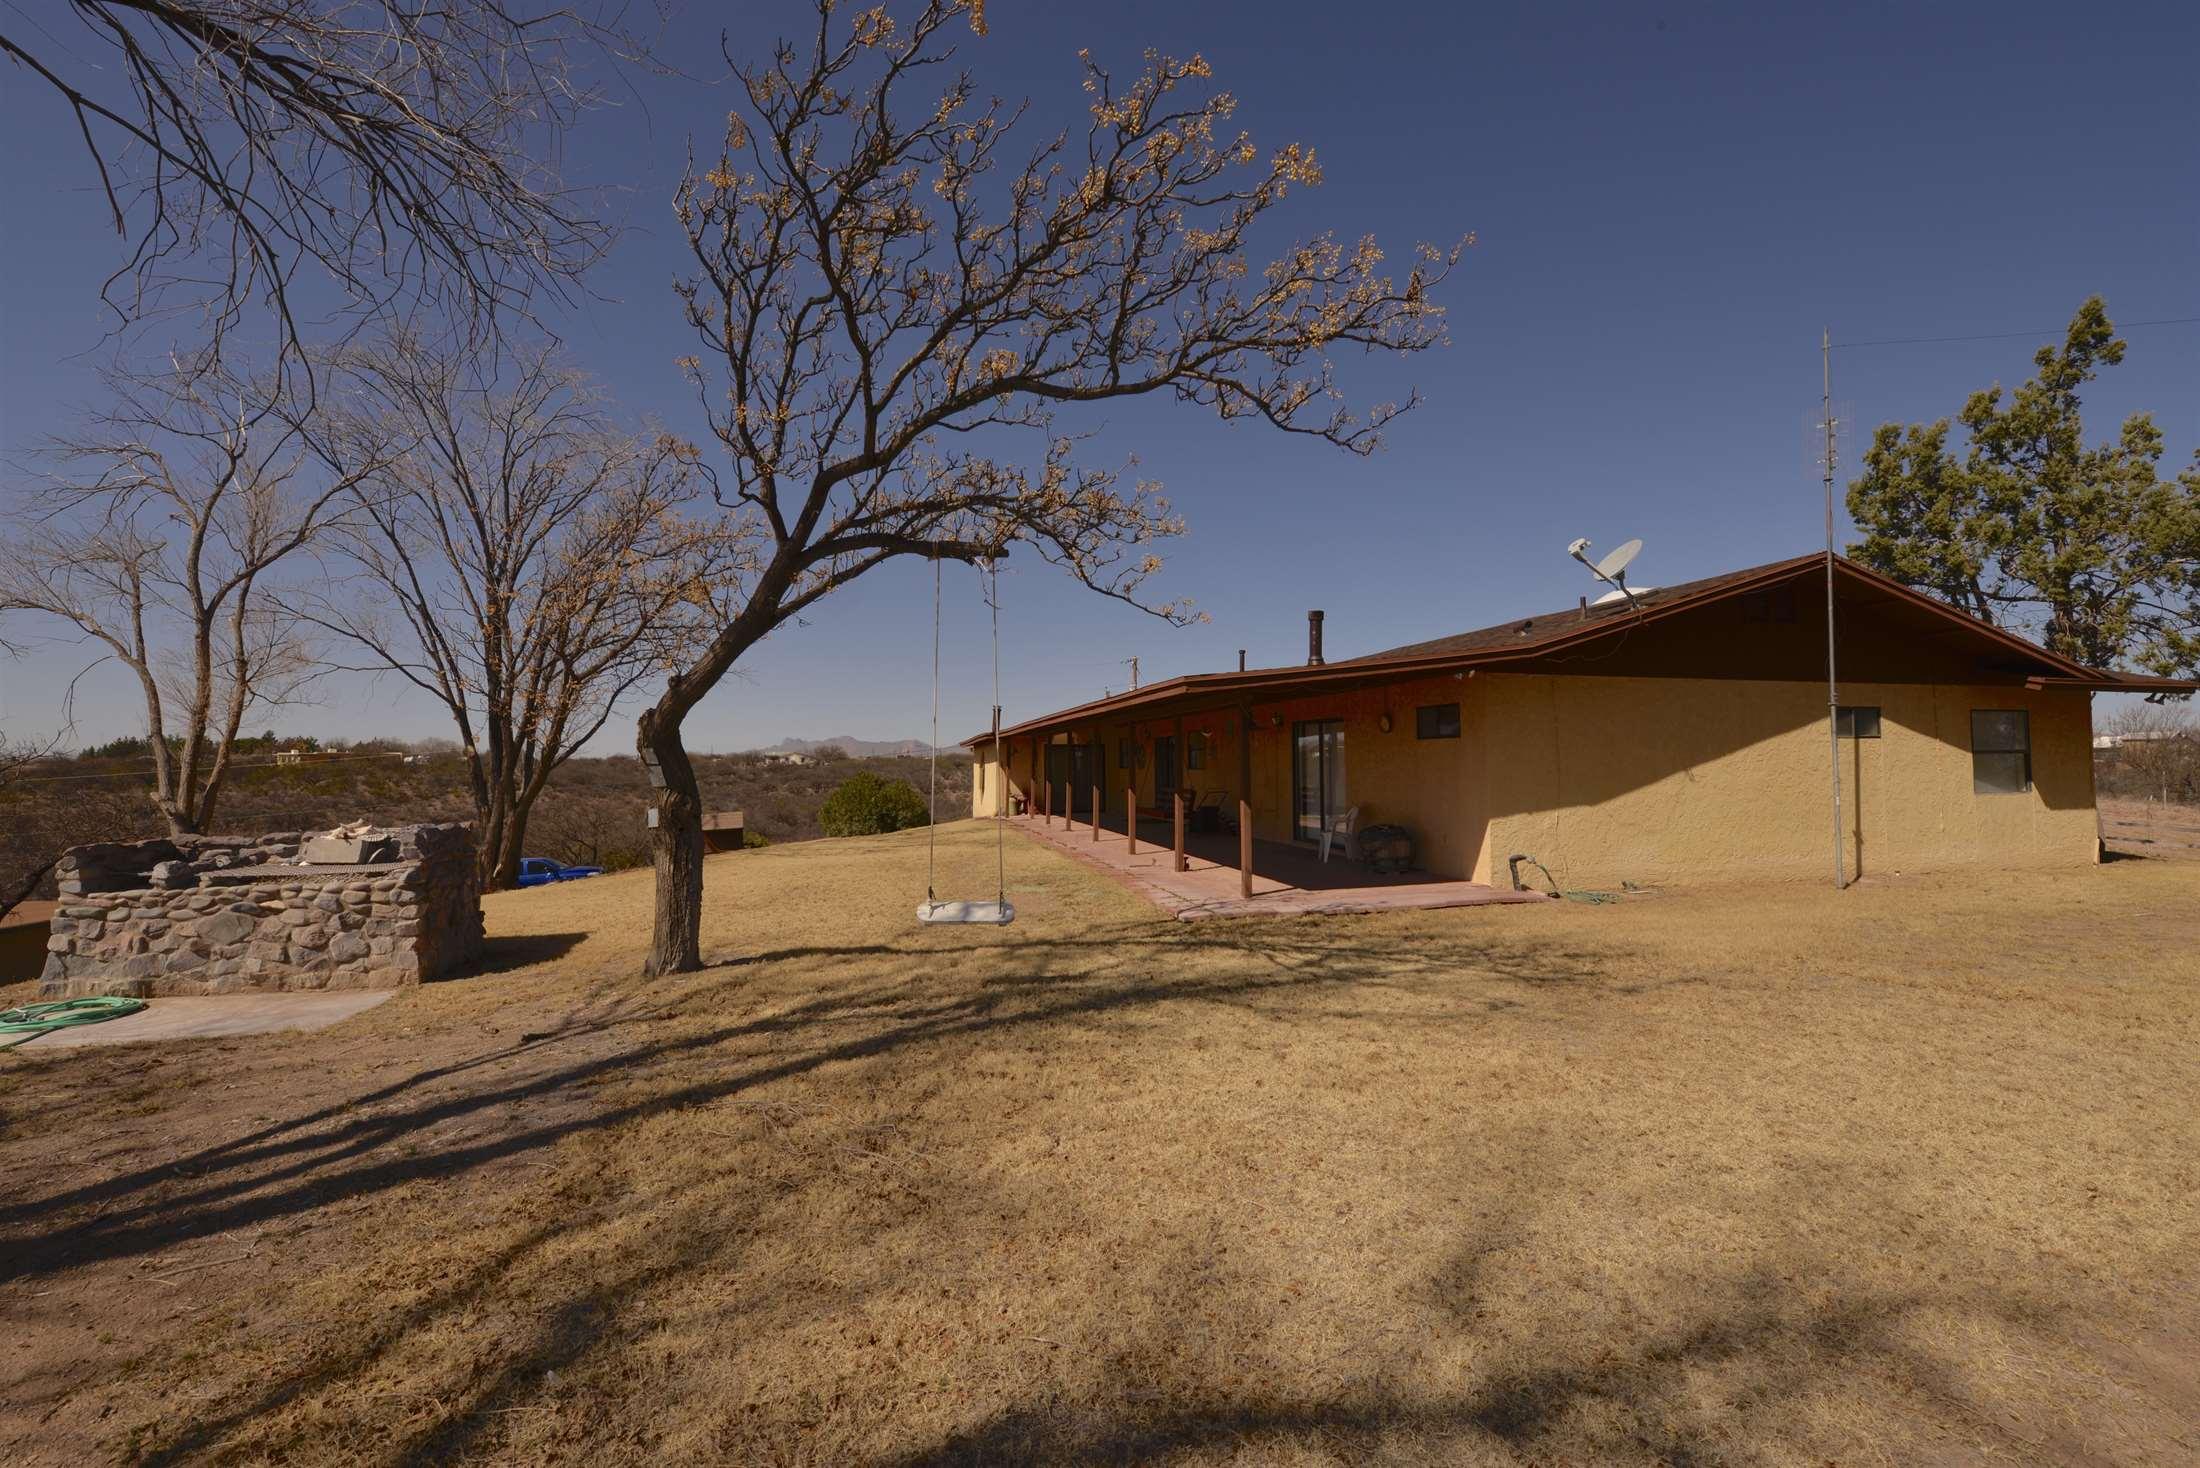 2121 N. Barber Rd, Huachuca City, AZ 85616